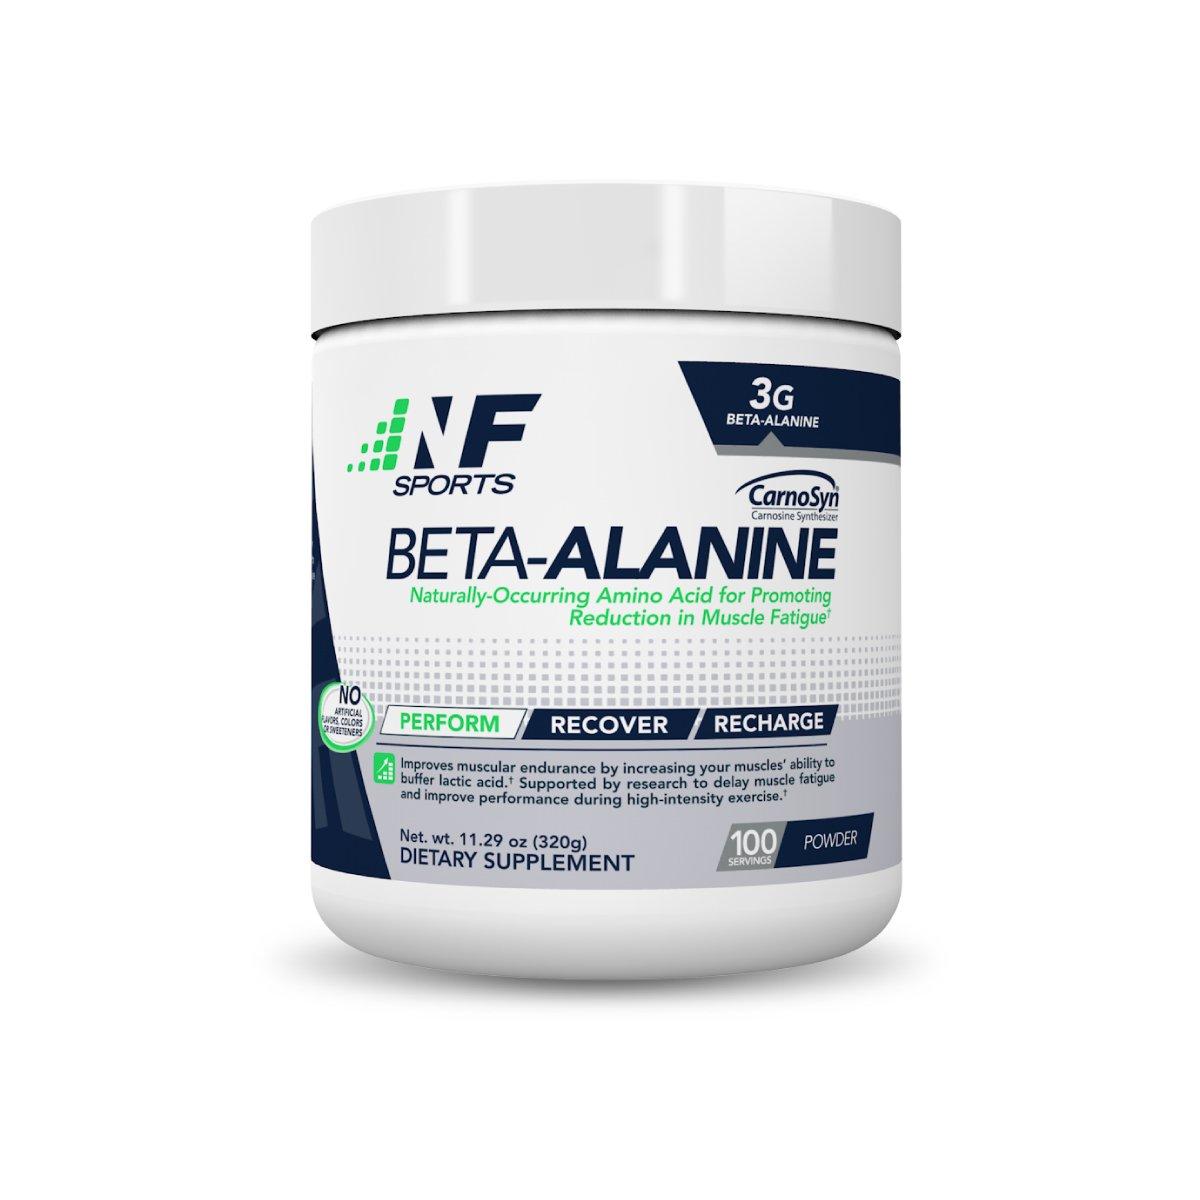 Image of Beta-Alanine Powder